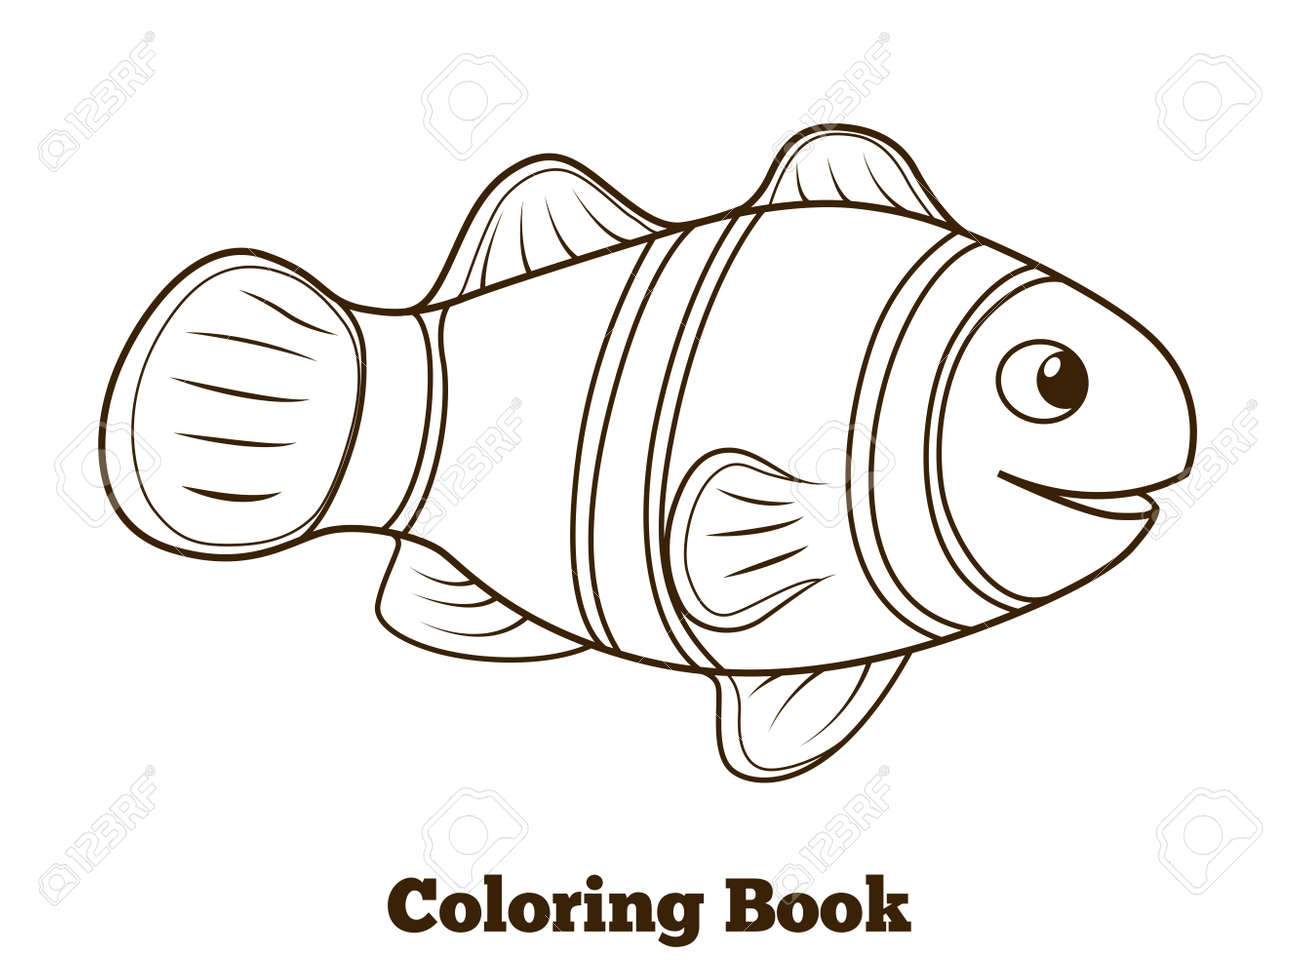 Hermosa Dibujos Animados De Payasos Para Colorear